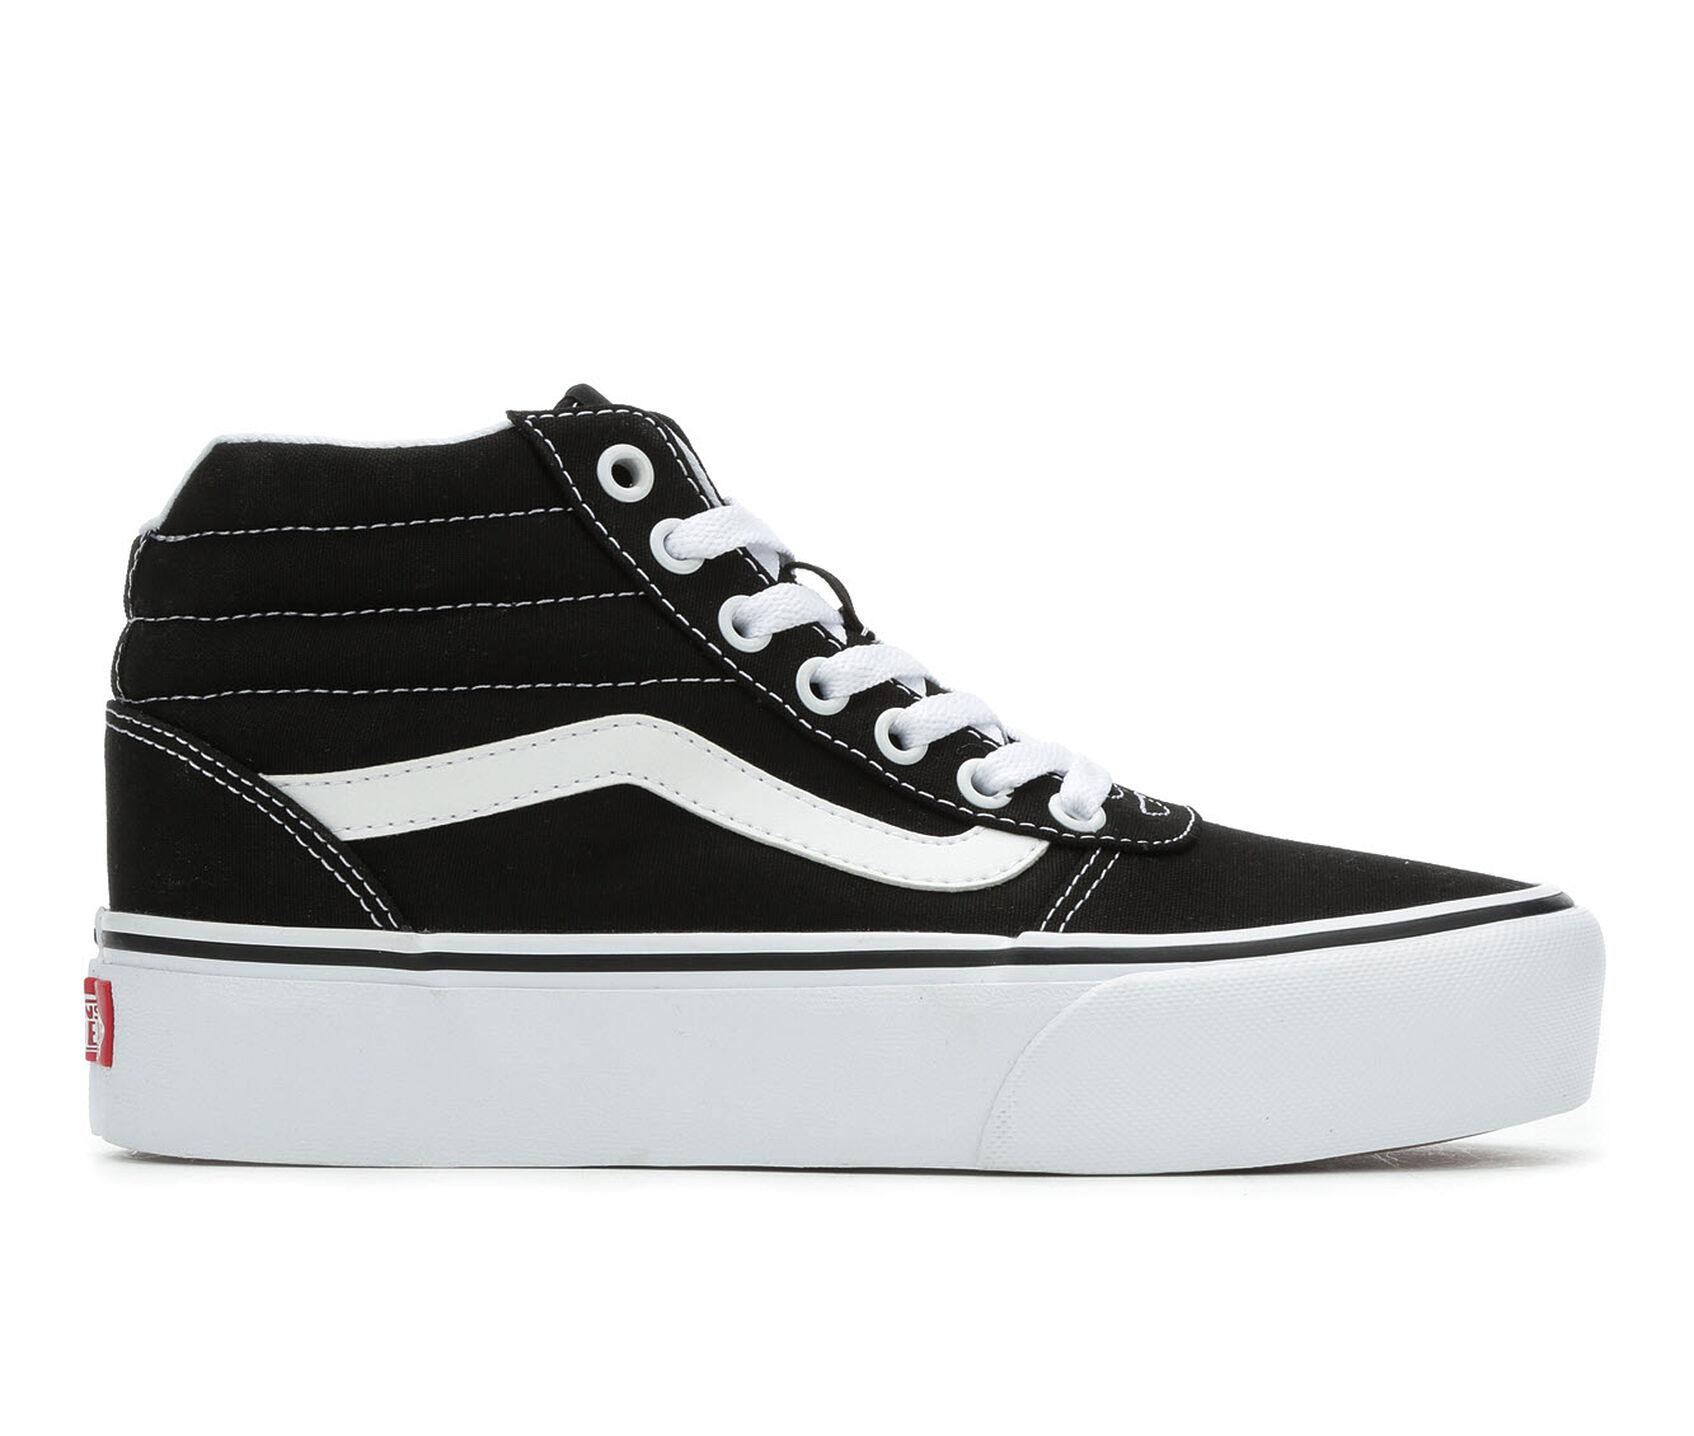 vans shoes under 30 dollars